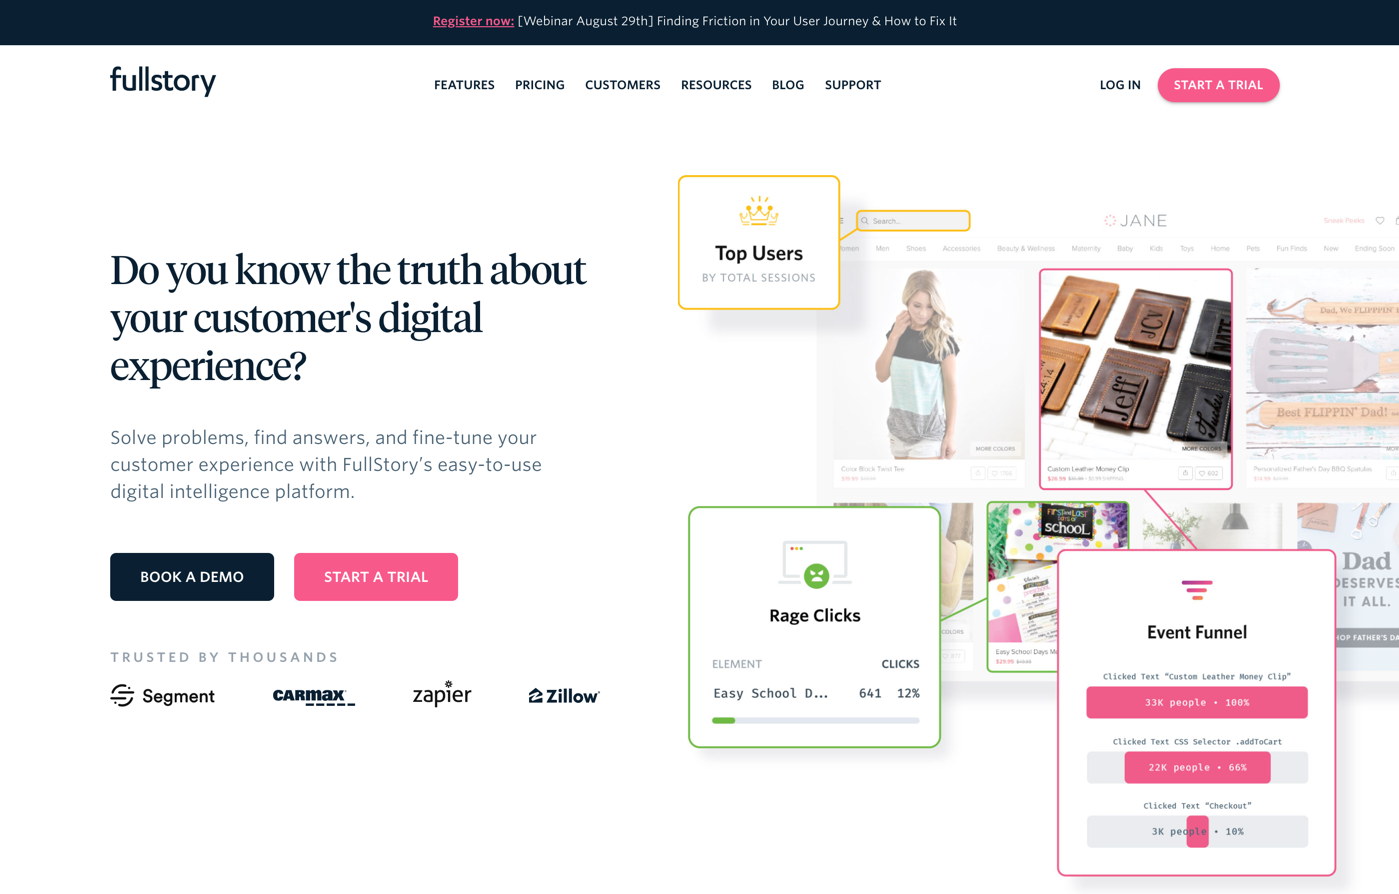 fullstory homepage